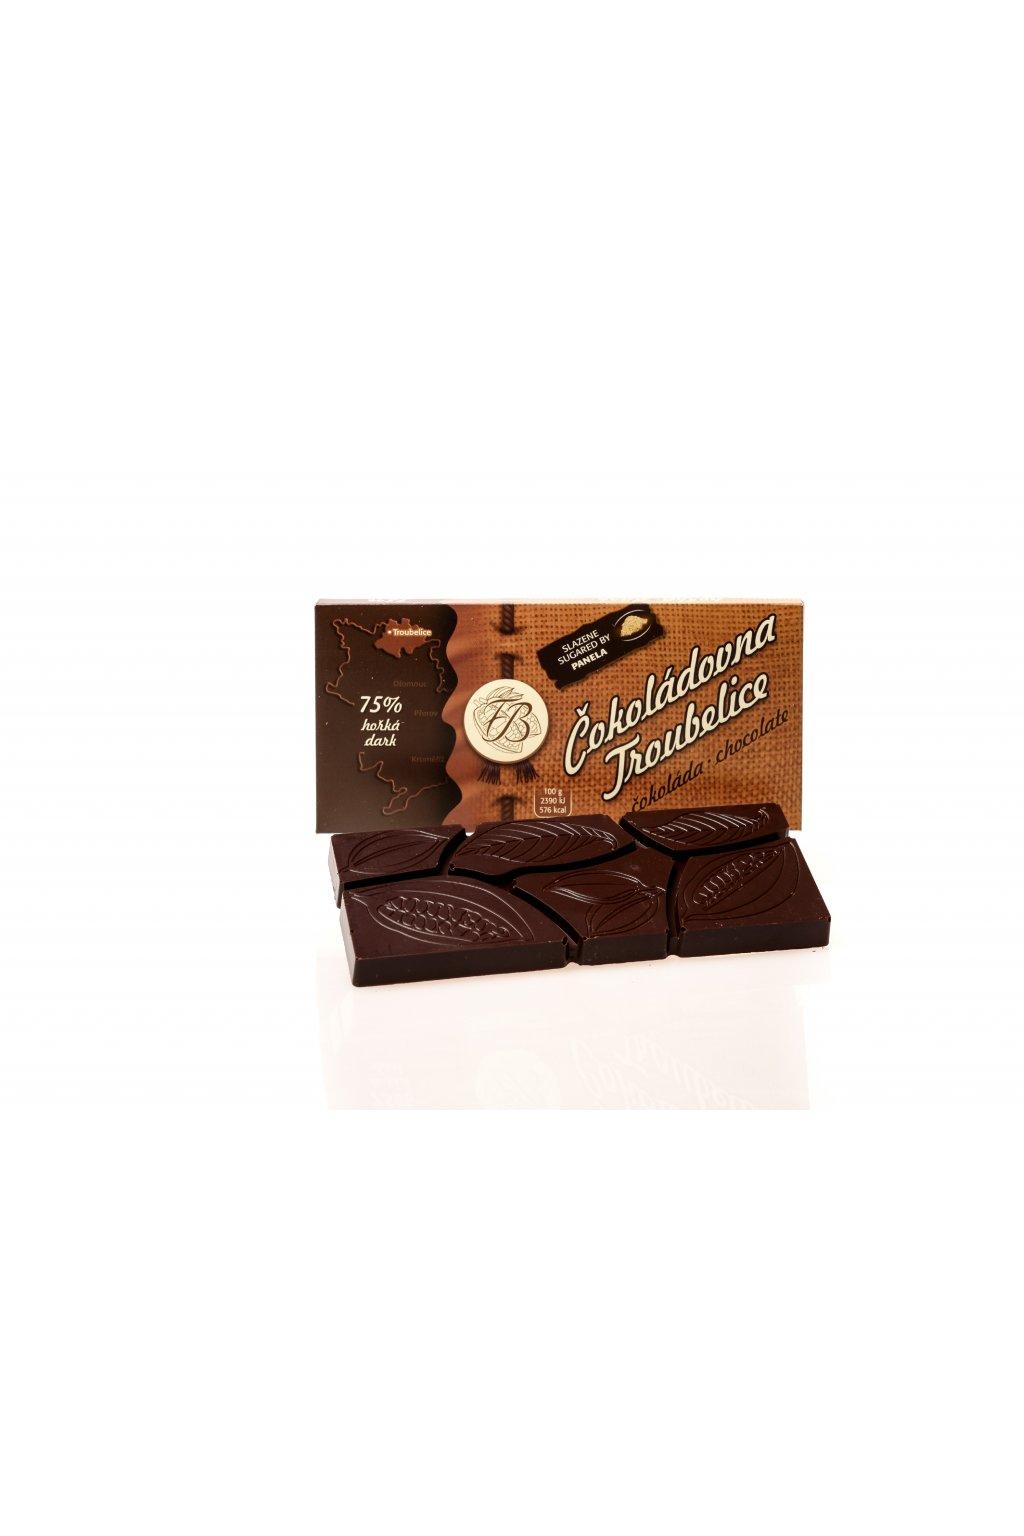 Cokoladovna troubelice 7